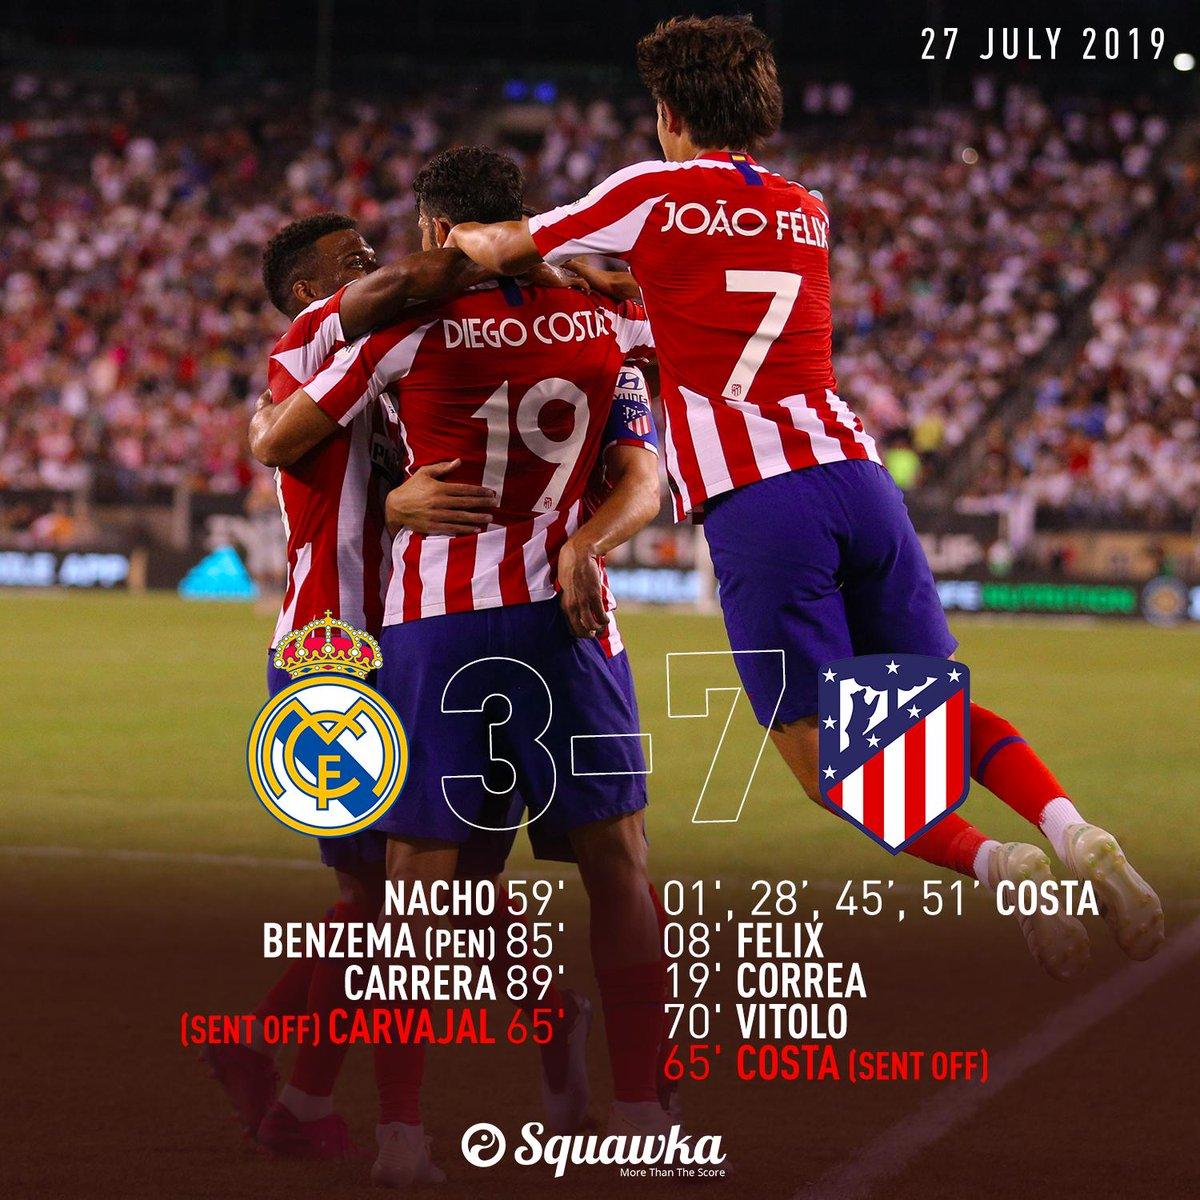 Squawka News On Twitter Real Madrid 3 7 Atletico Madrid Ft Costa Felix Correa Costa Costa Pen Costa Vitolo Nacho Benzema Pen Carrera